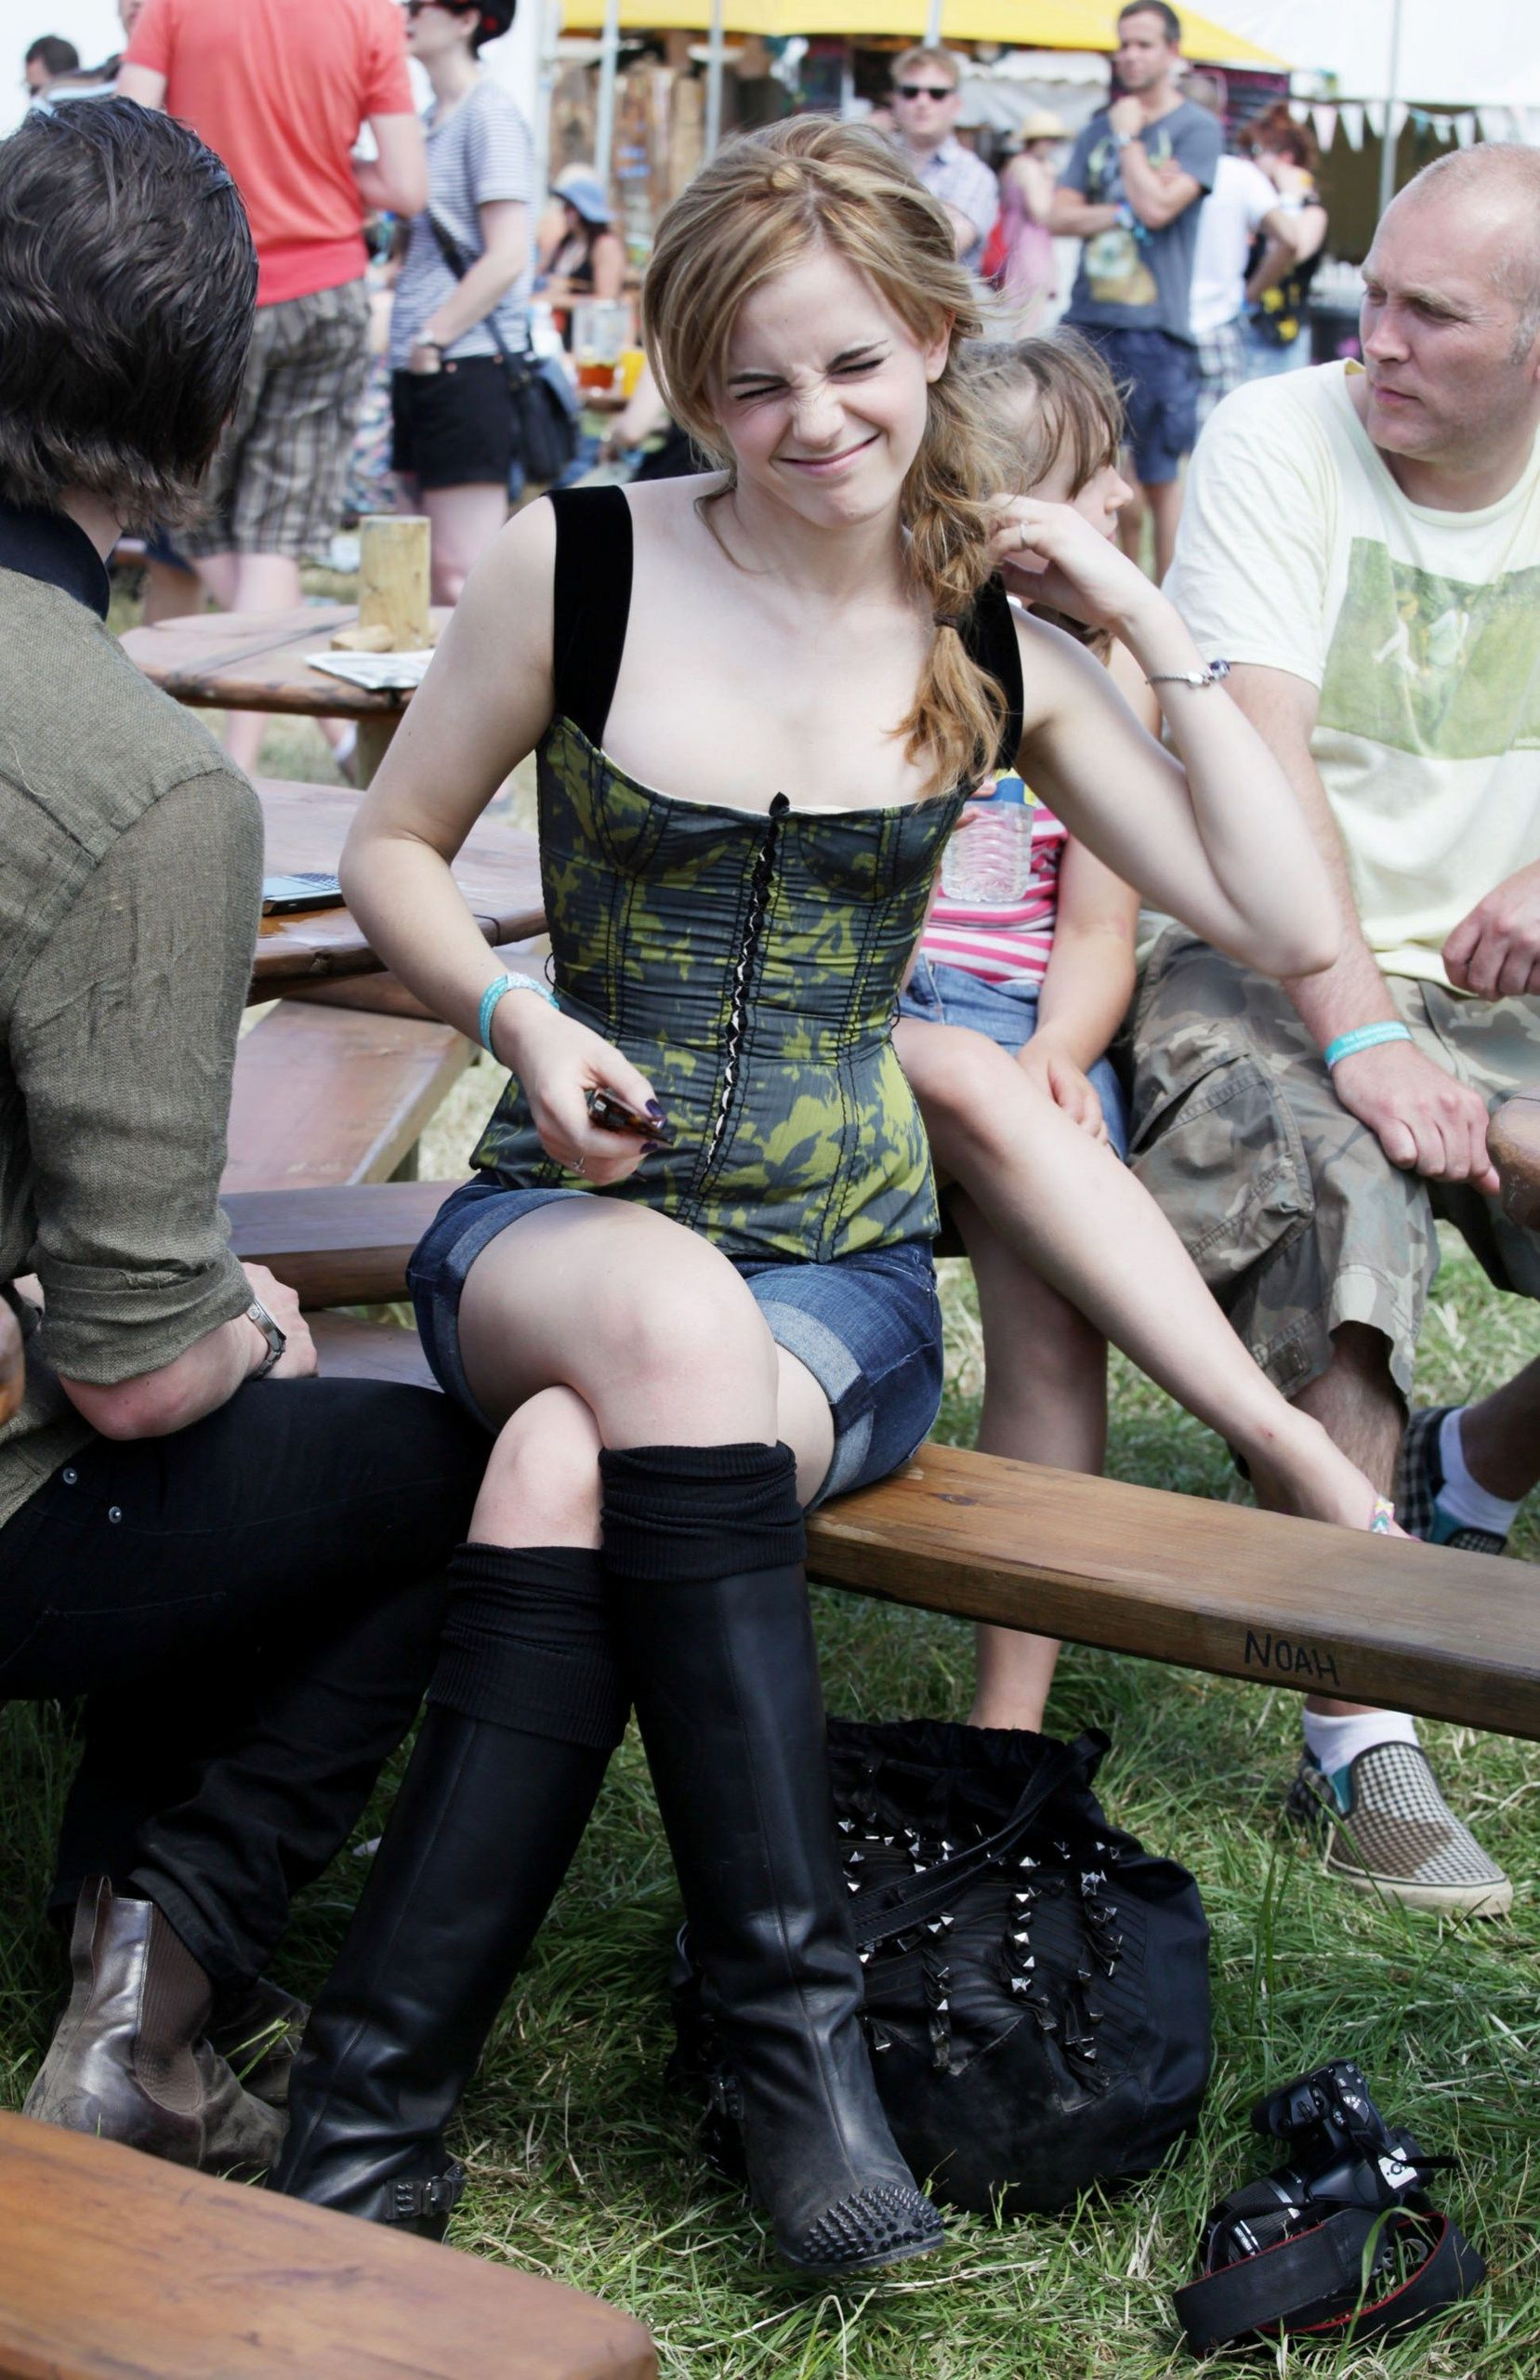 2010 Glastonbury Musica Festival in Somerset, England (25.06.10) [HQ]